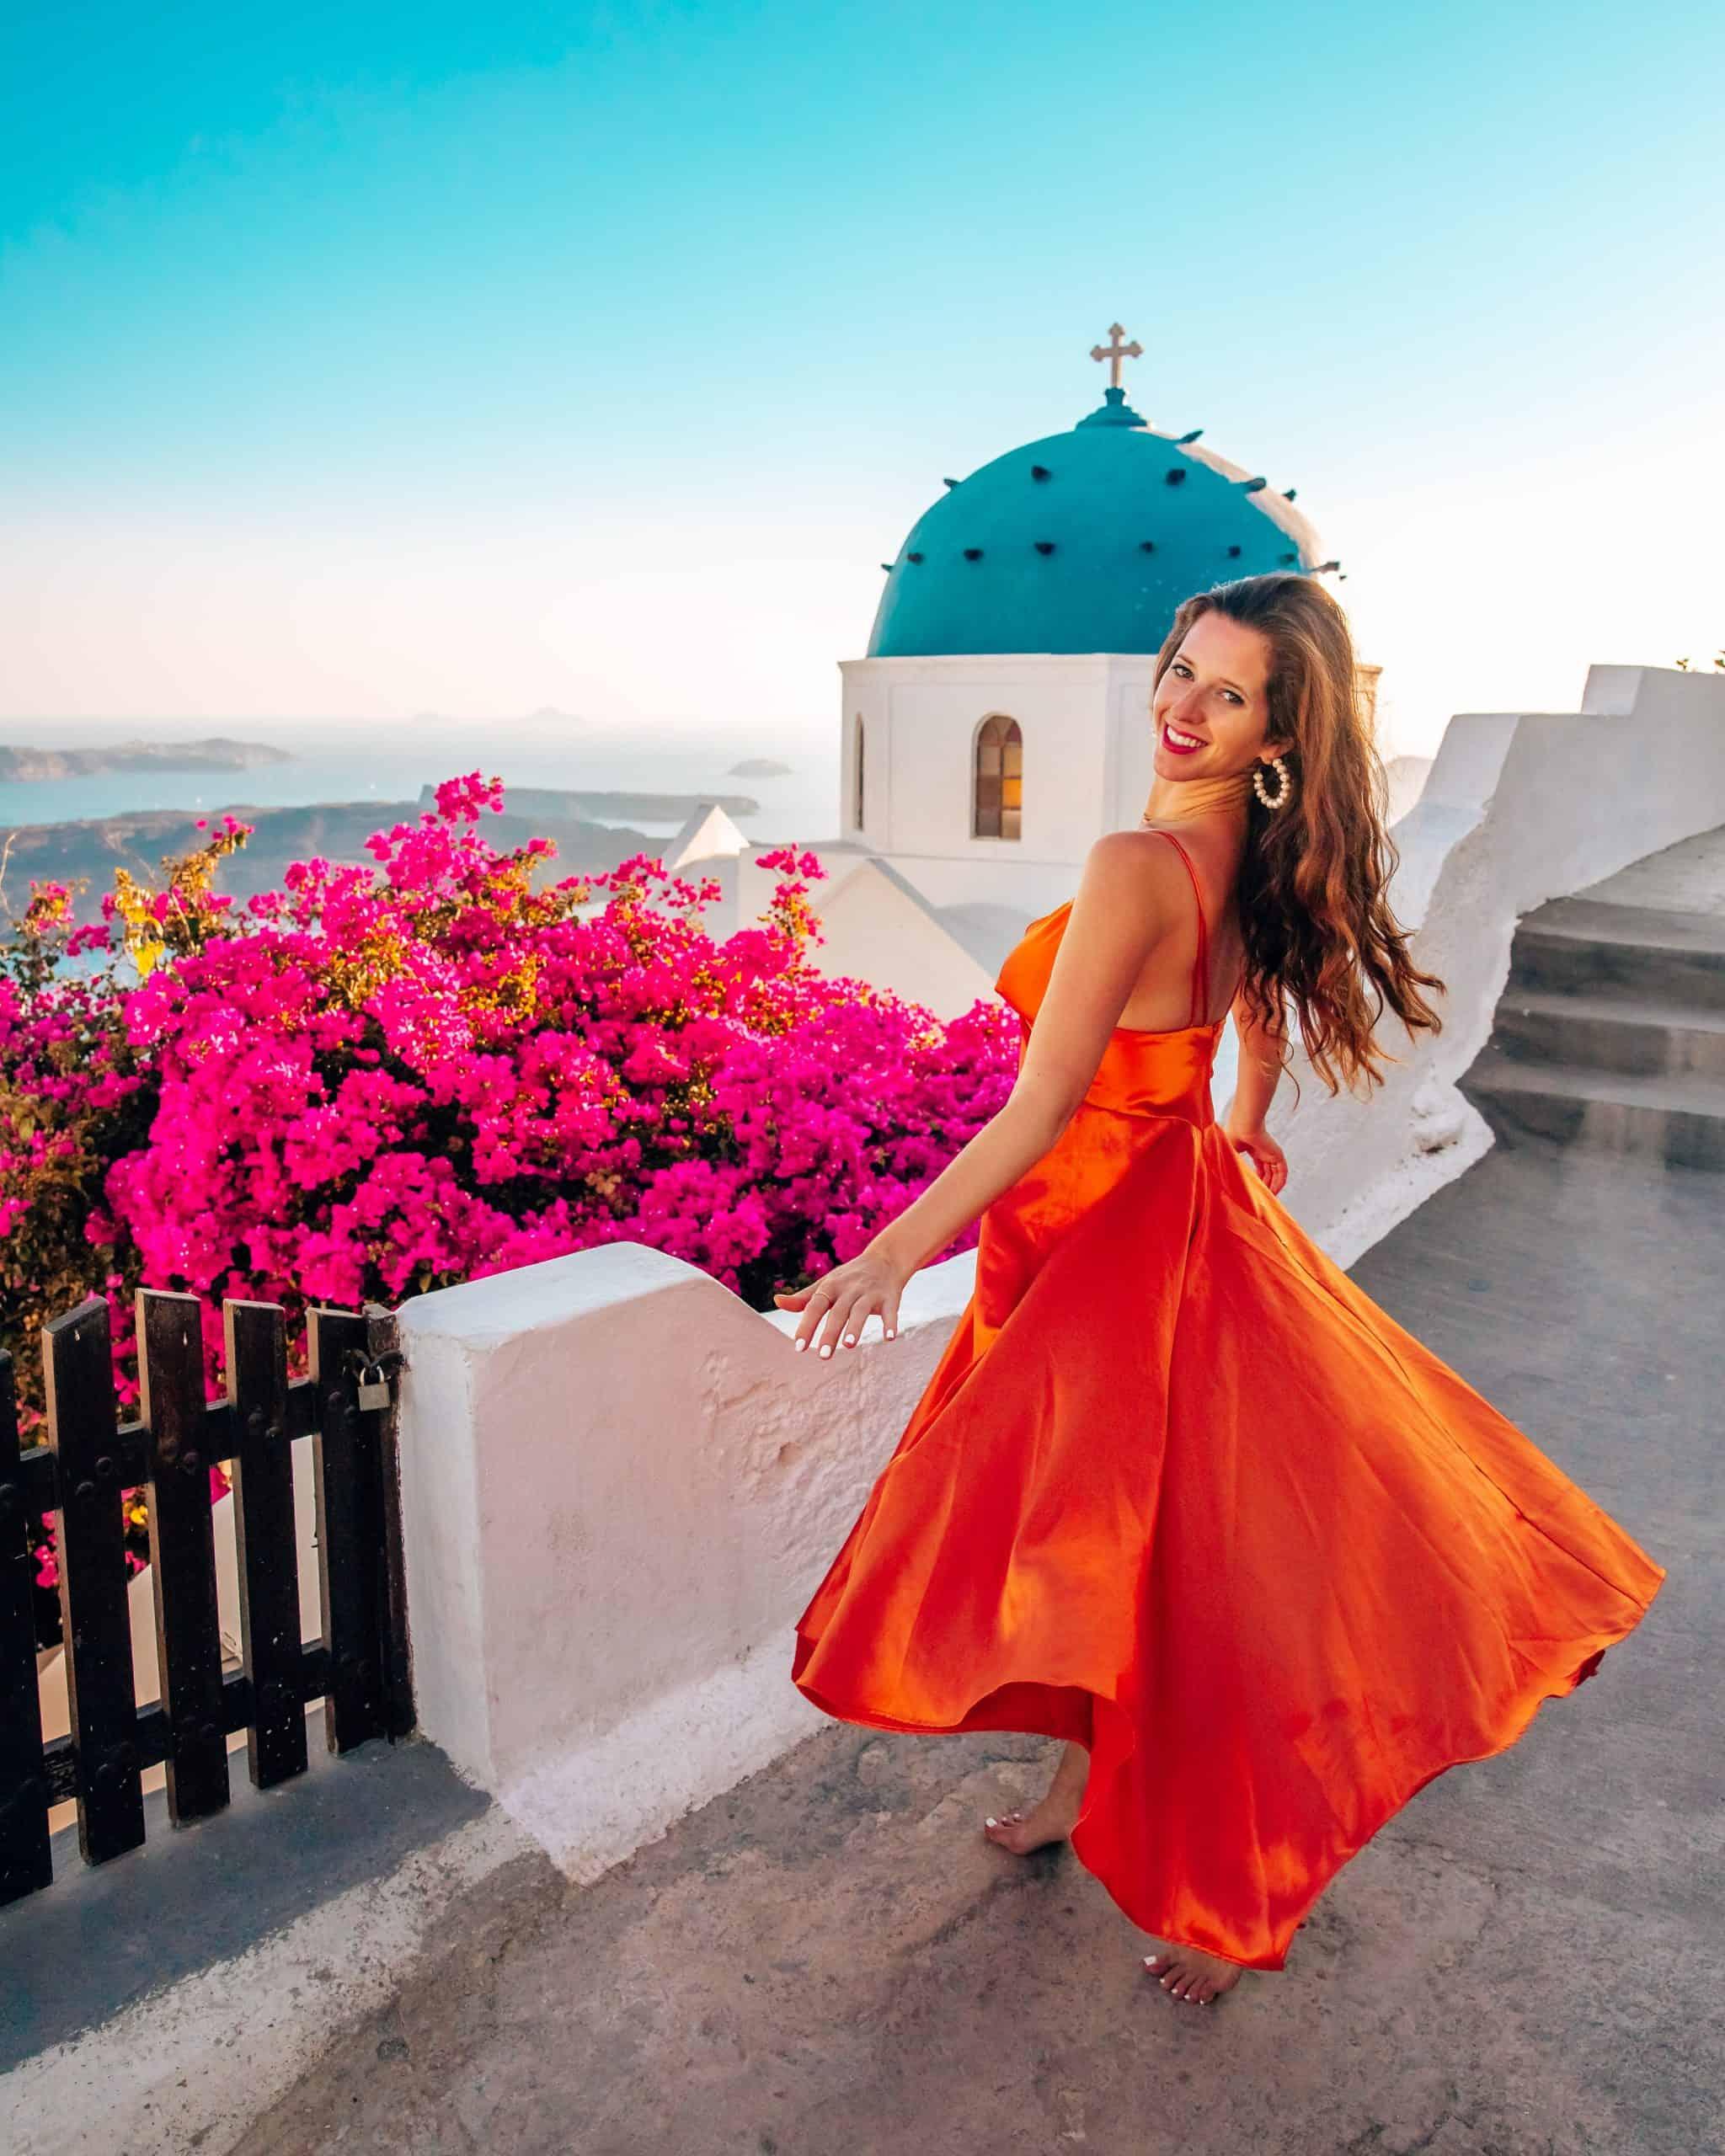 Bettina twirling at Blue Dome Church in Imerovigli, Santorini